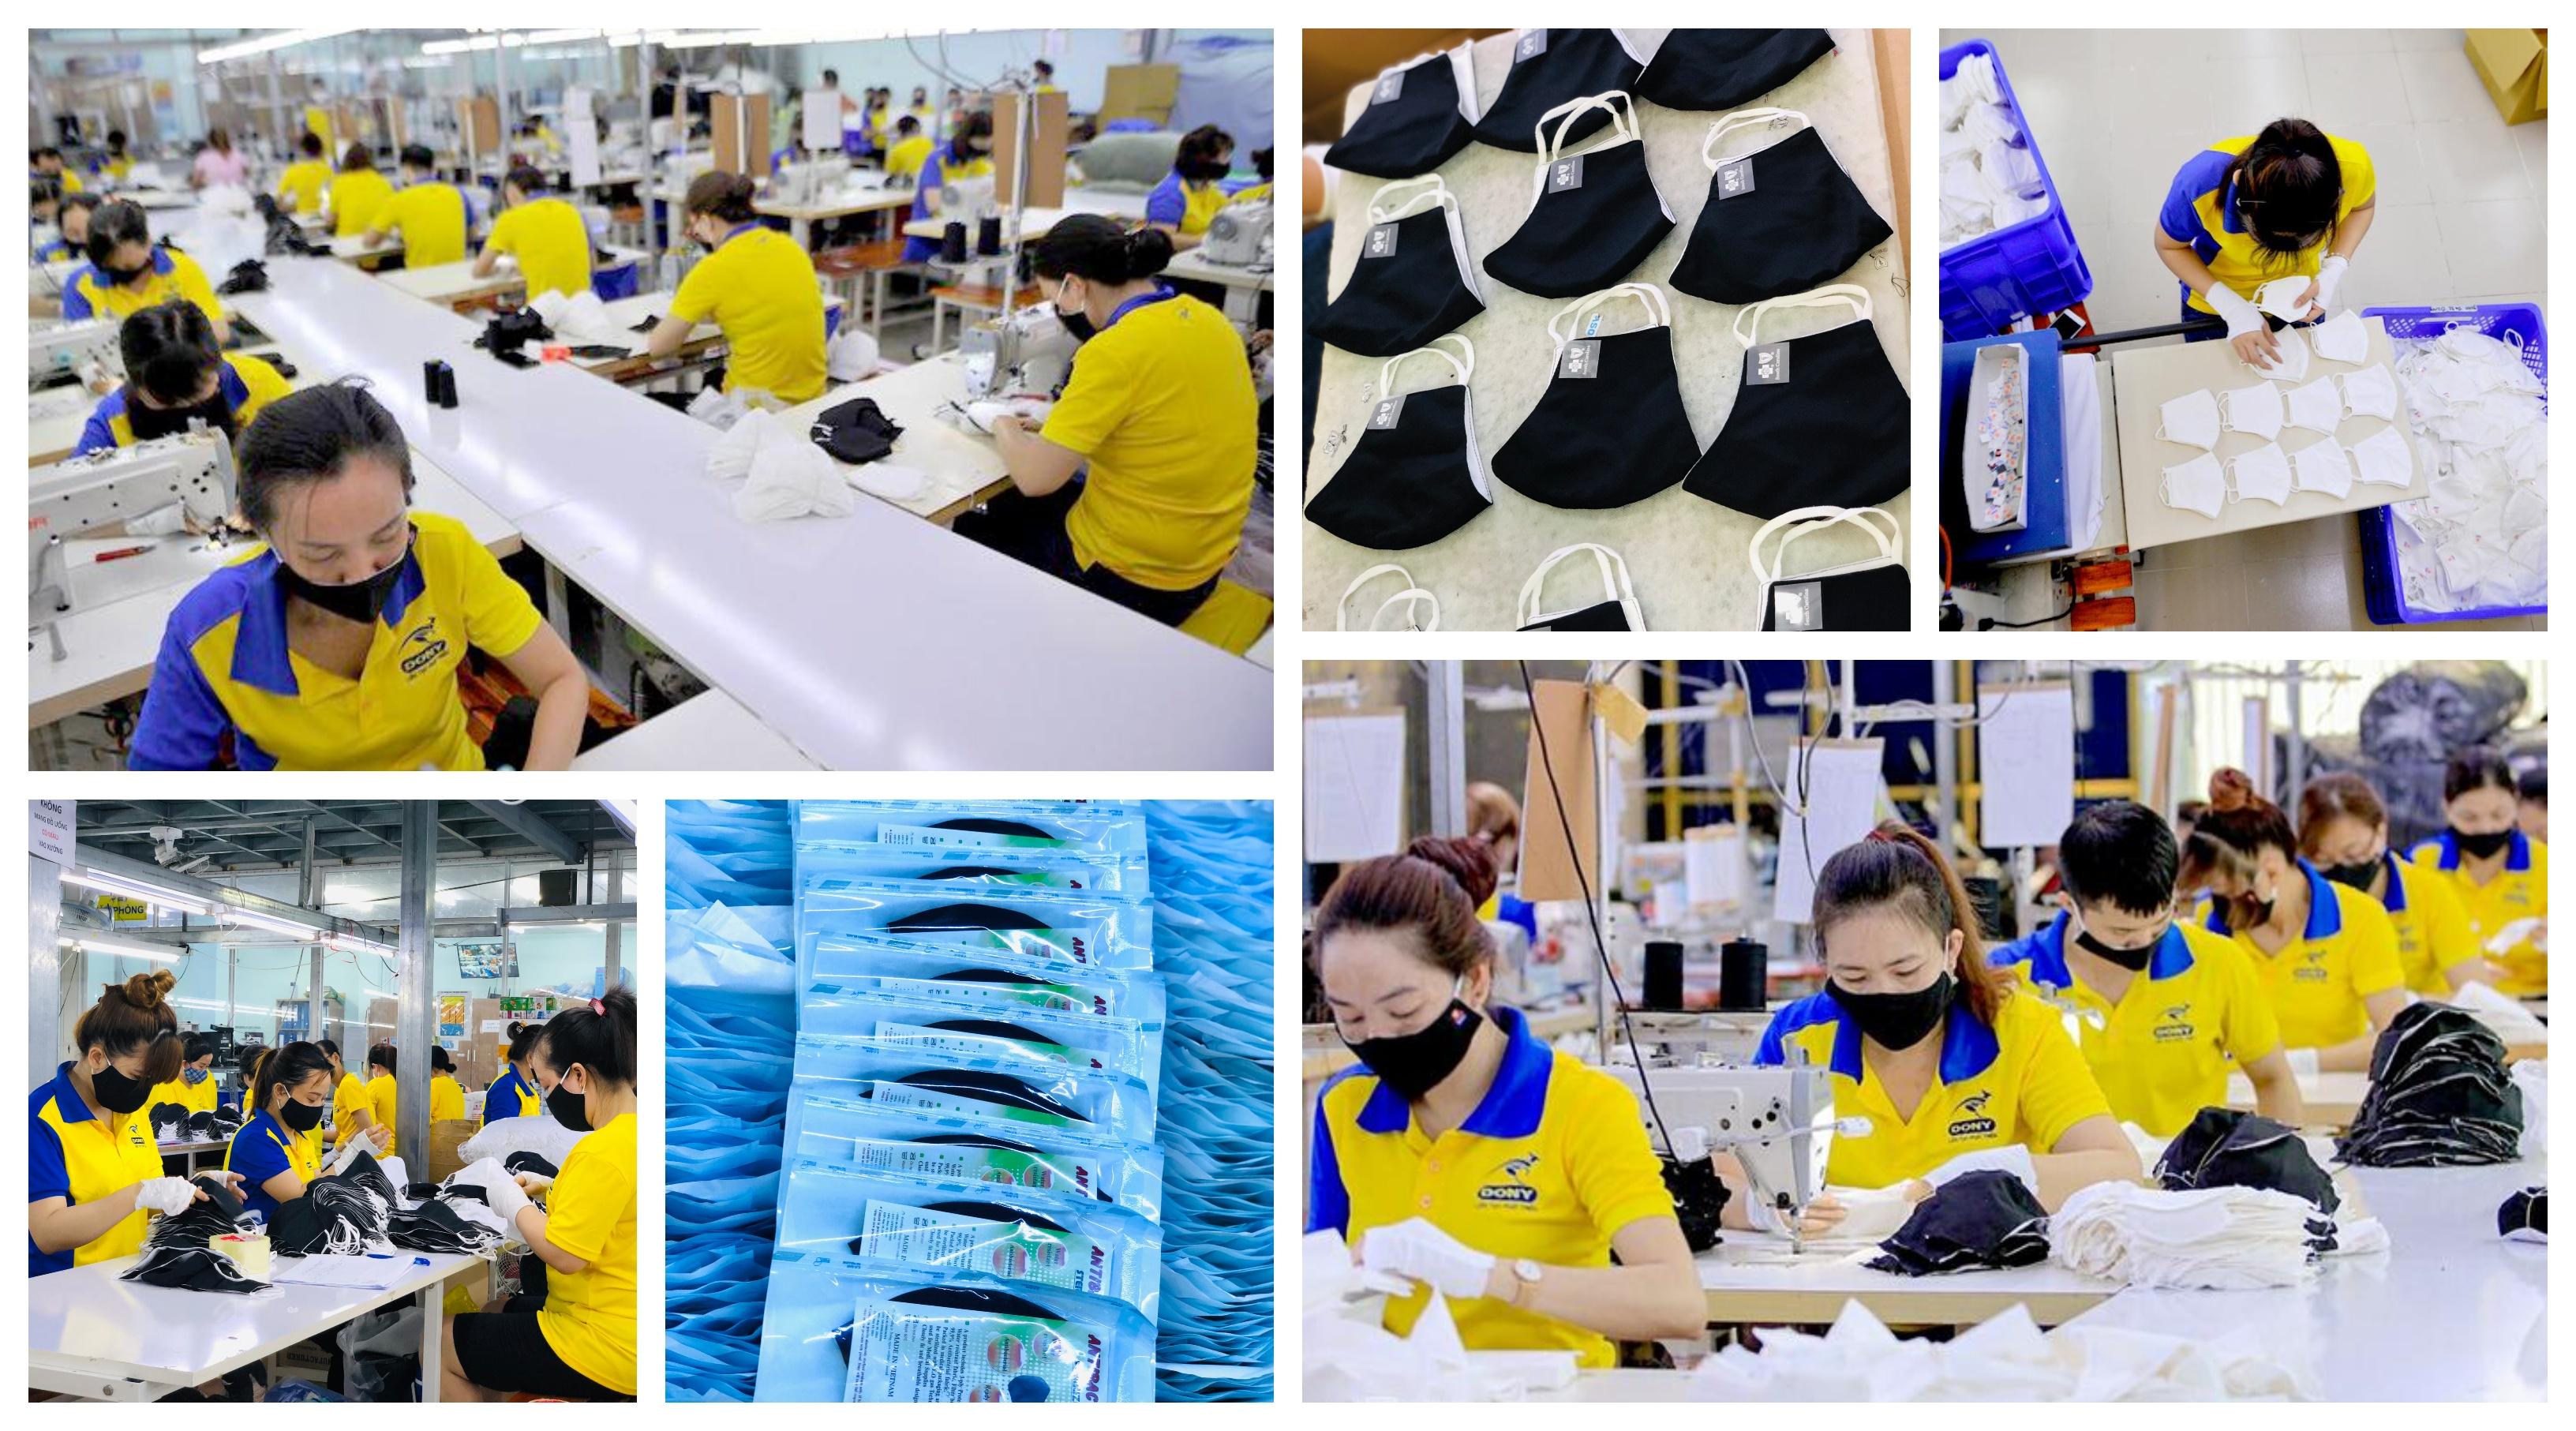 Dony Mask - Wholesale face mask supplier exporter to GGC Countries (Bahrain, Kuwait, Oman, Qatar, Saudi Arabia, UAE)